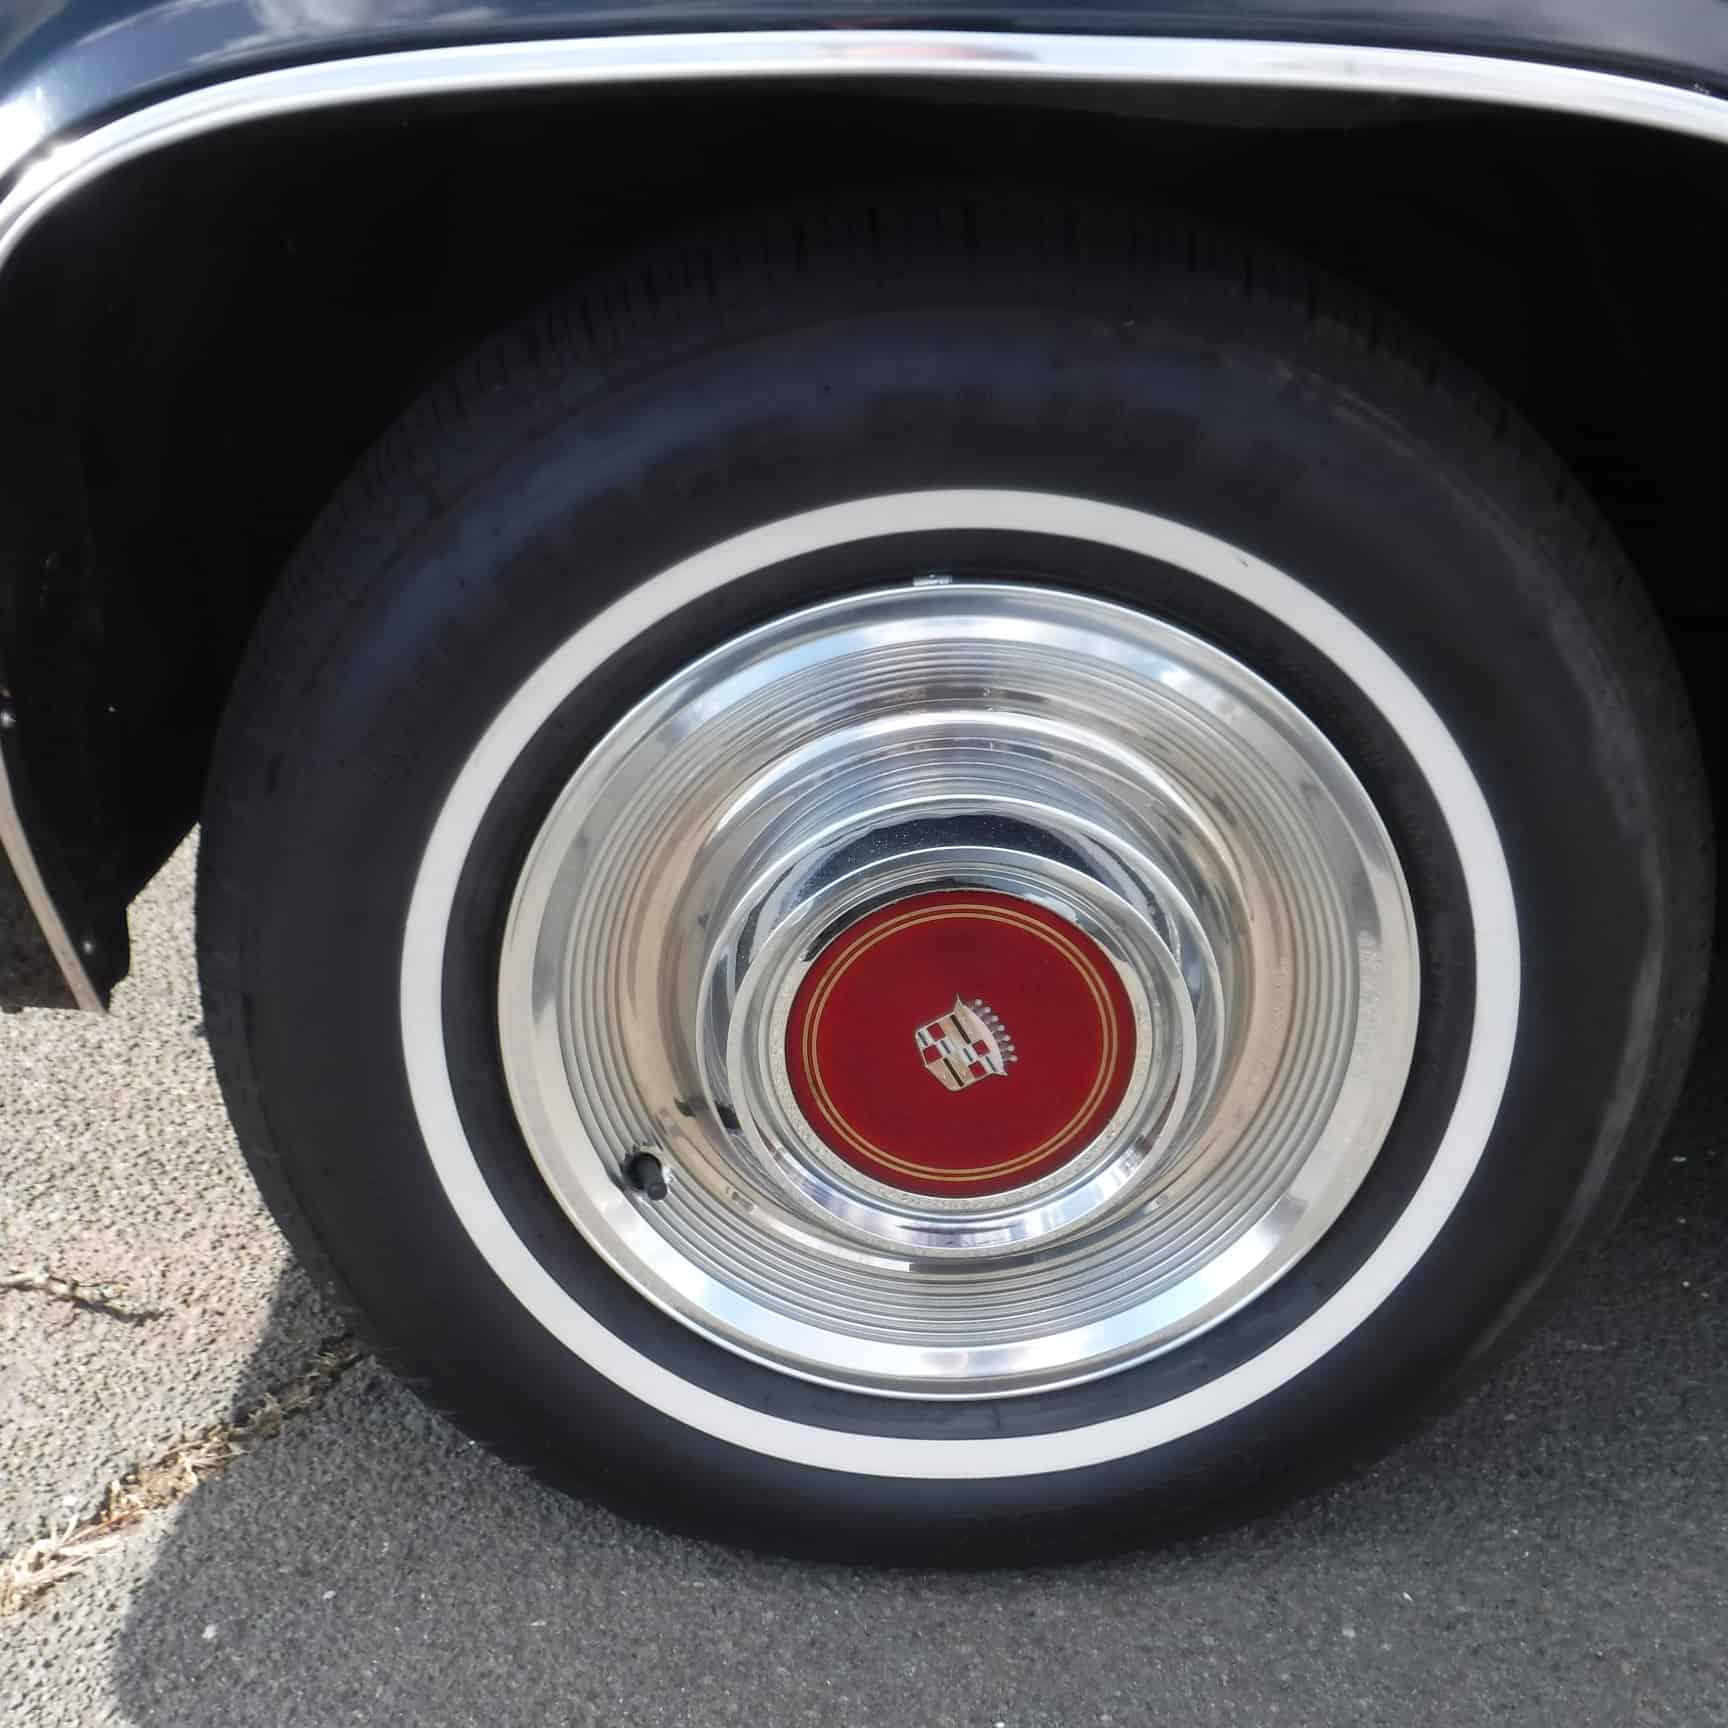 1980 Cadillac 049